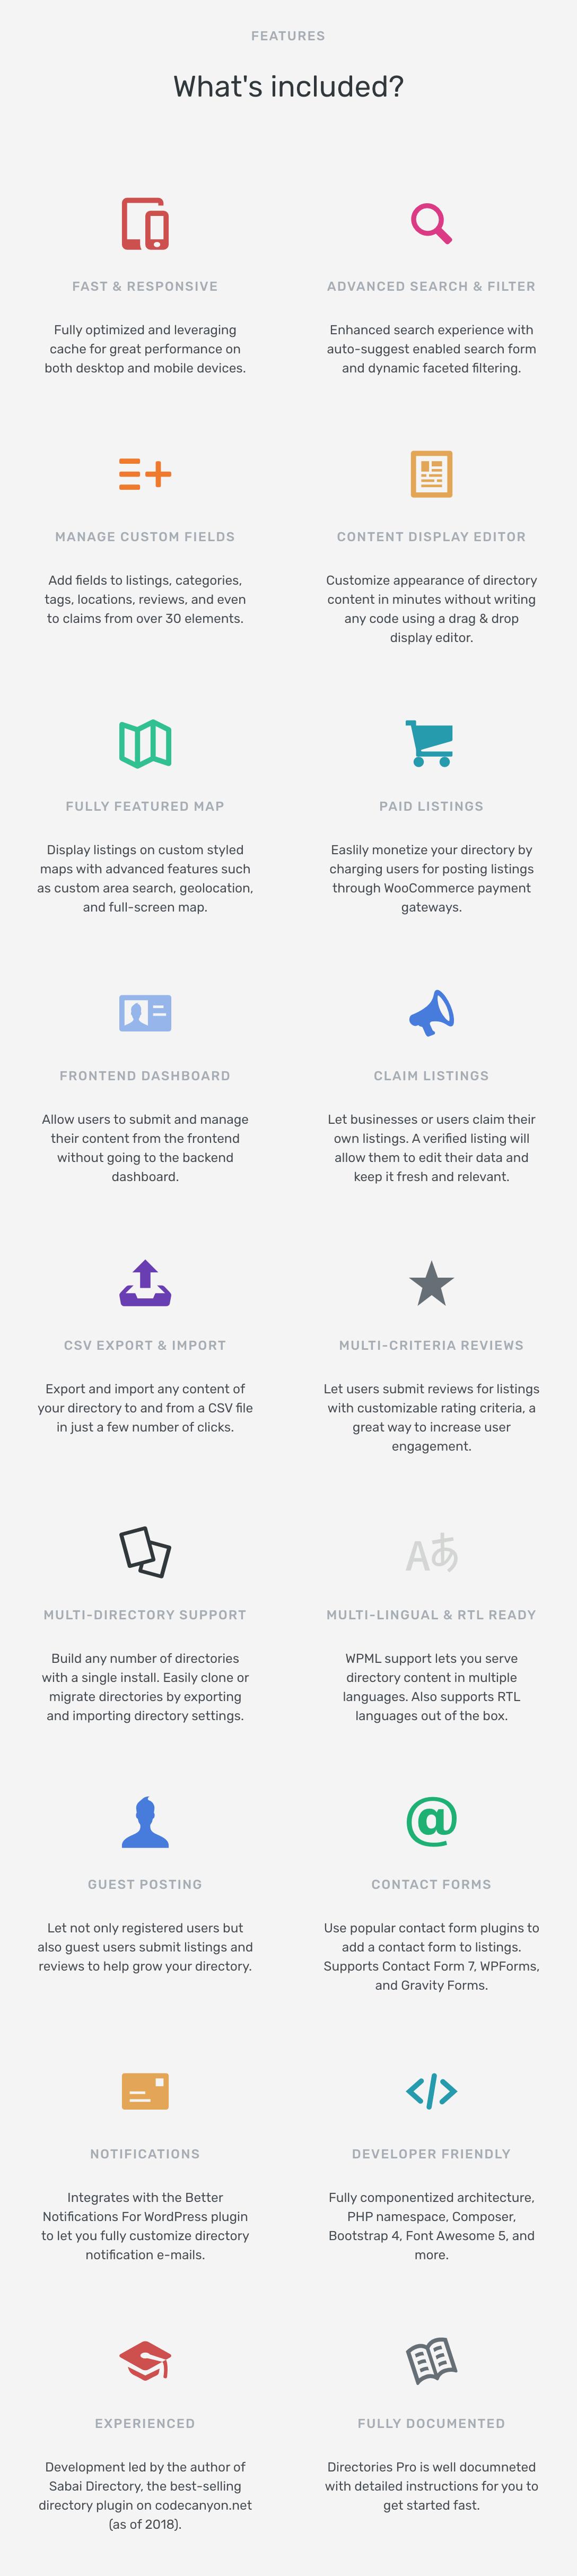 Directories Pro features